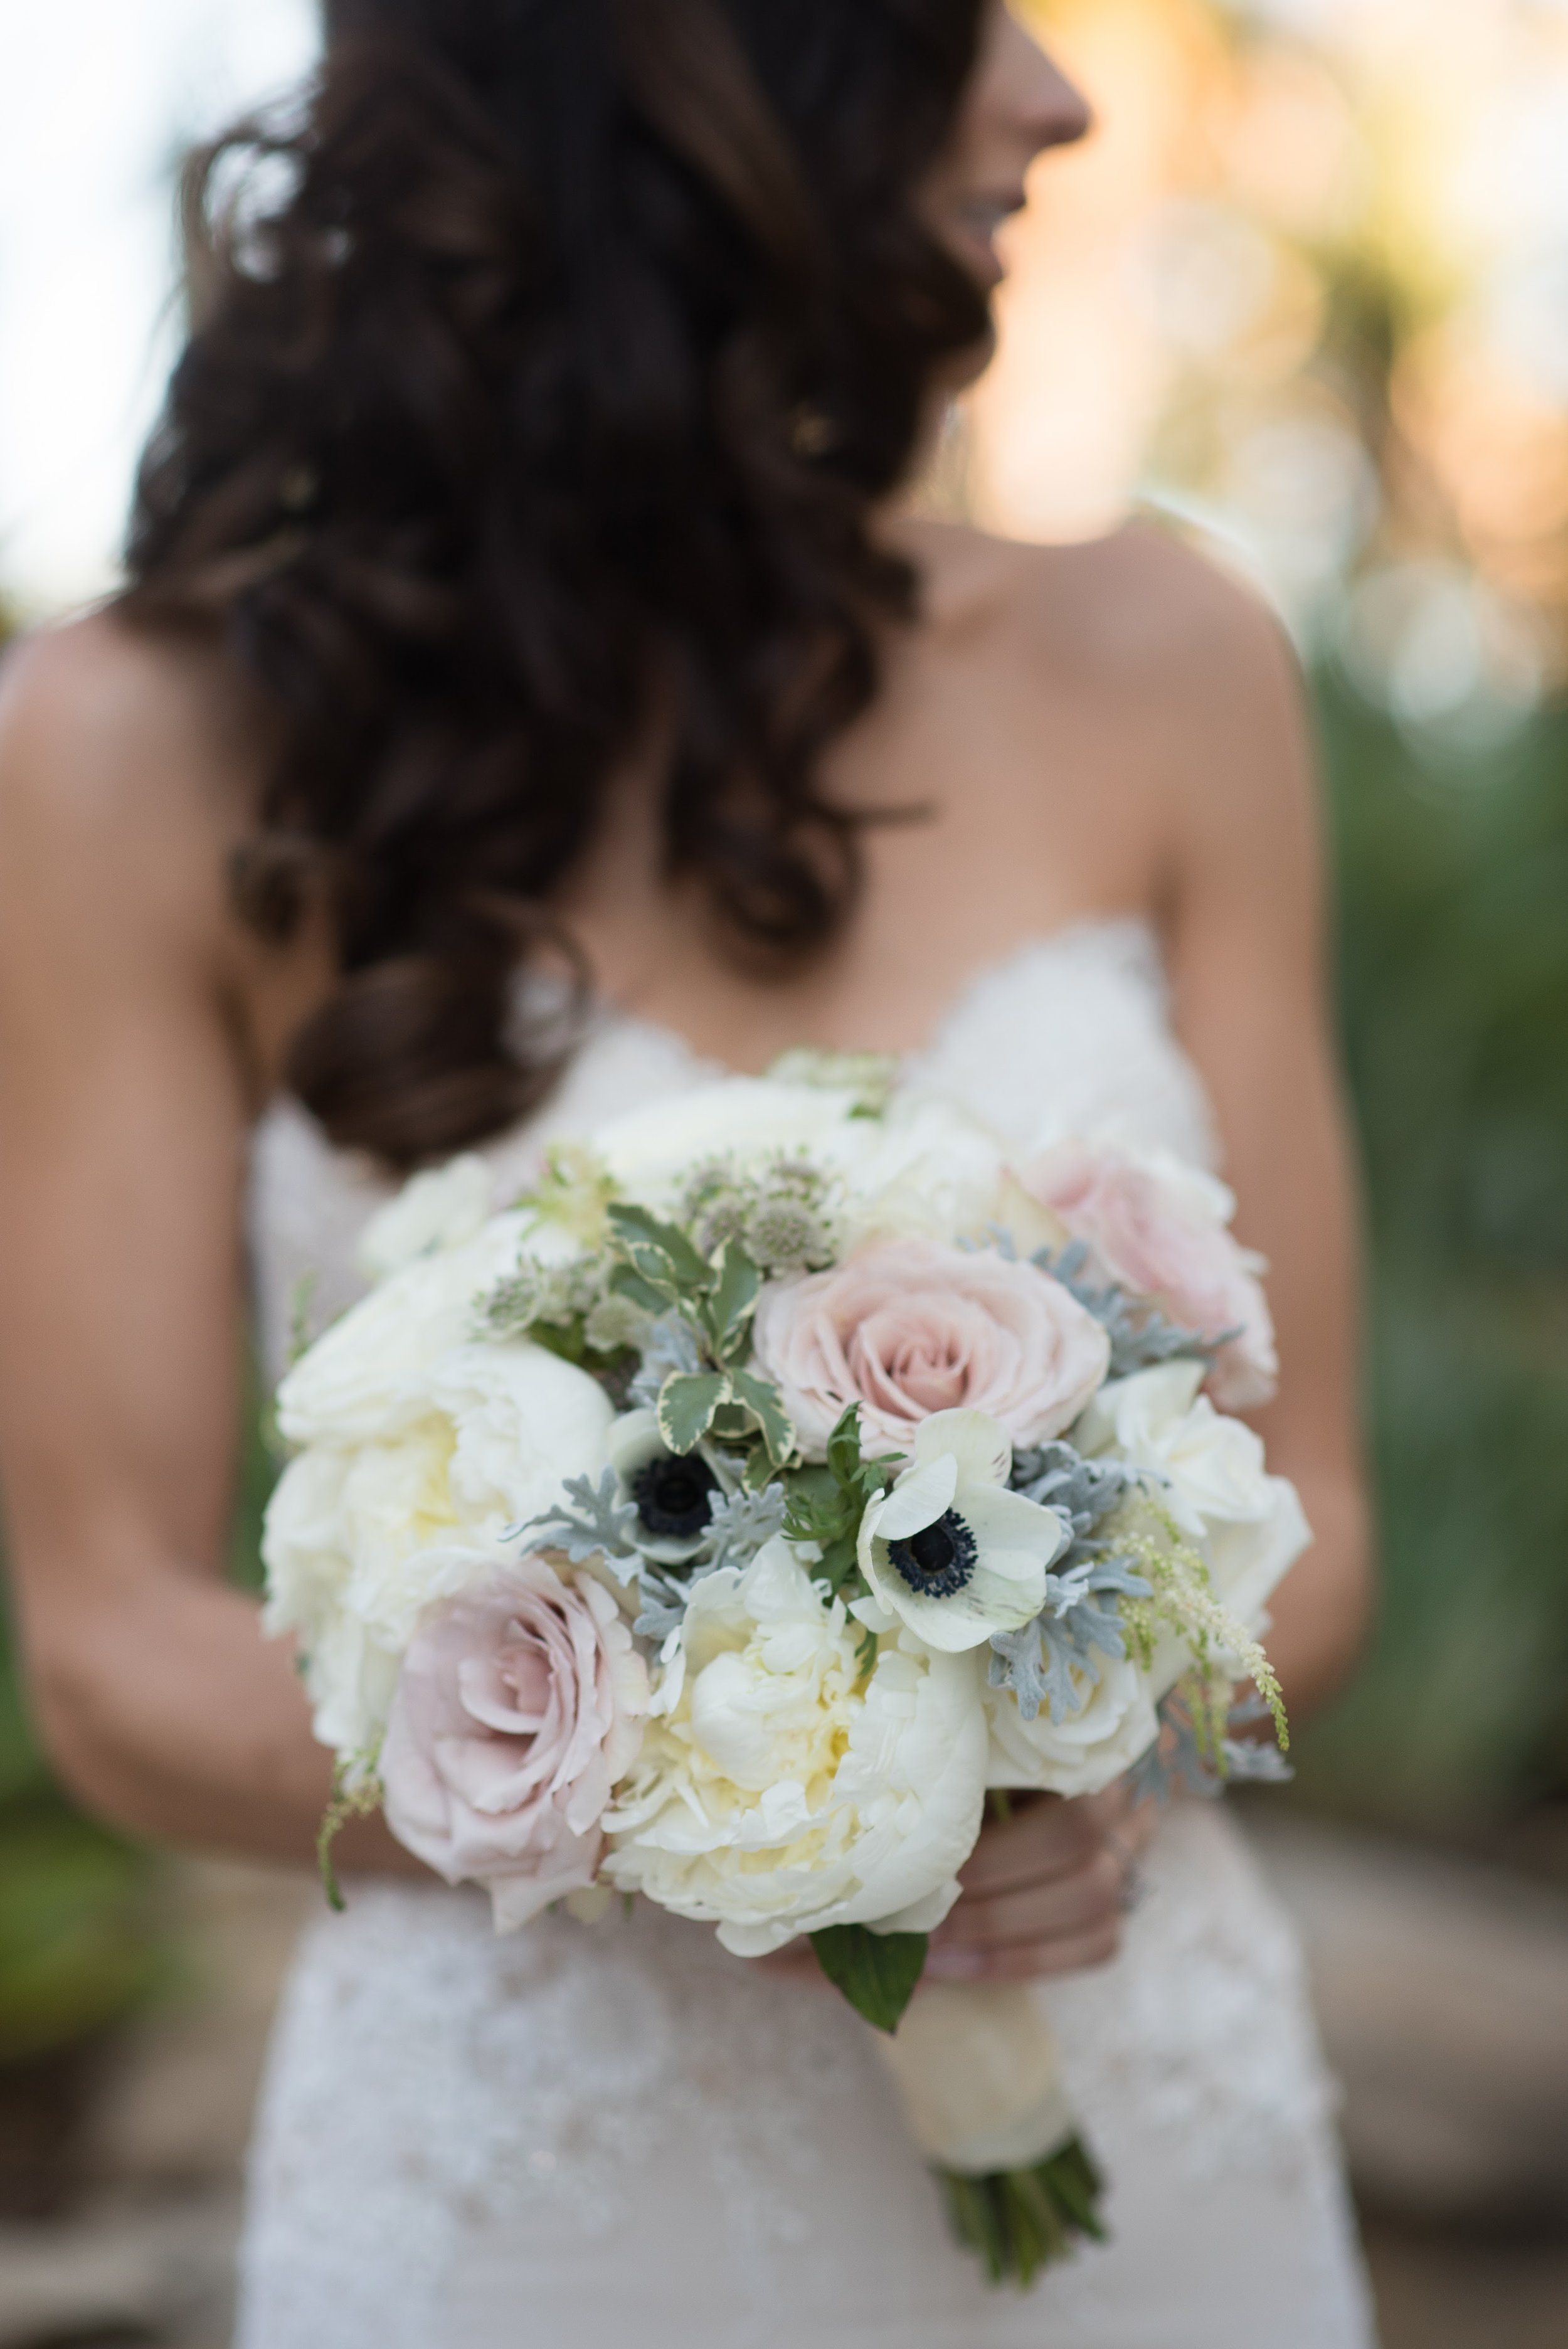 www.santabarbaraweddingstyle.com | Santa Barbara Wedding Style | Precious and Blooming | El Encanto Wedding | Nate and Jenny Weddings | Bride Bouquet Soft PInk